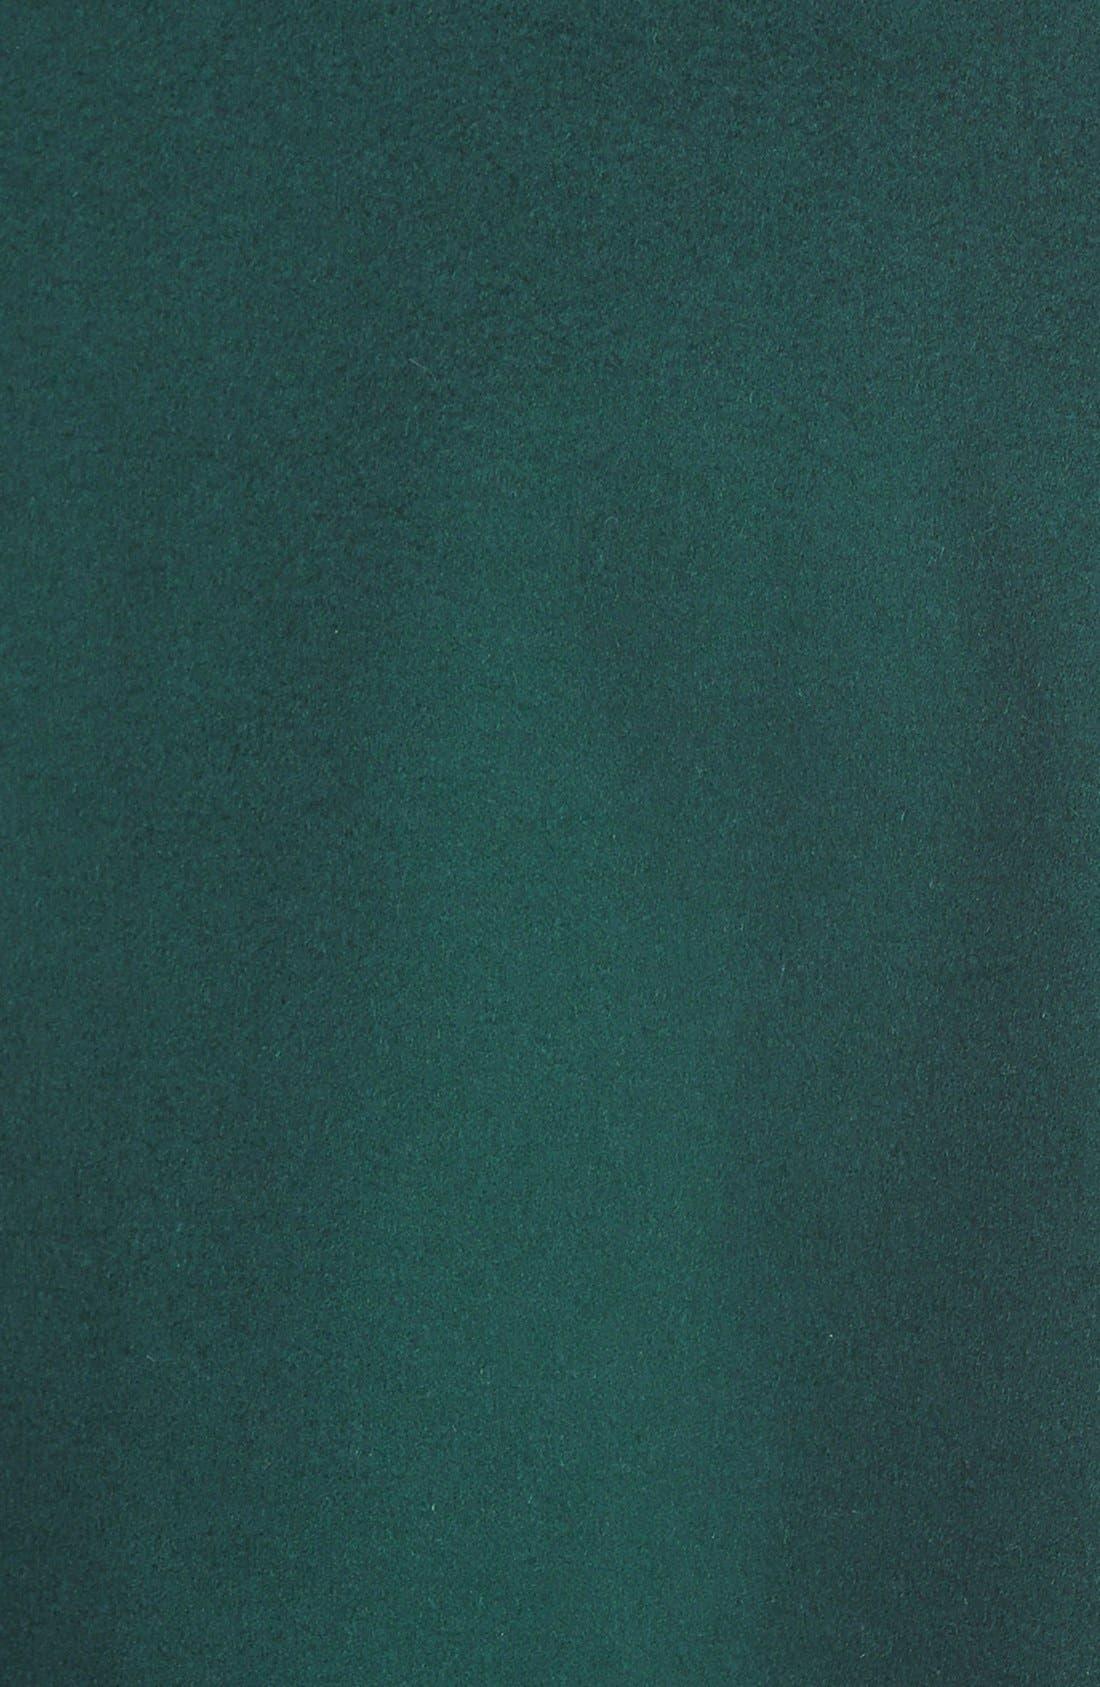 Alternate Image 3  - Diane von Furstenberg 'Harlow' Drape Collar Wool Blend Wrap Coat